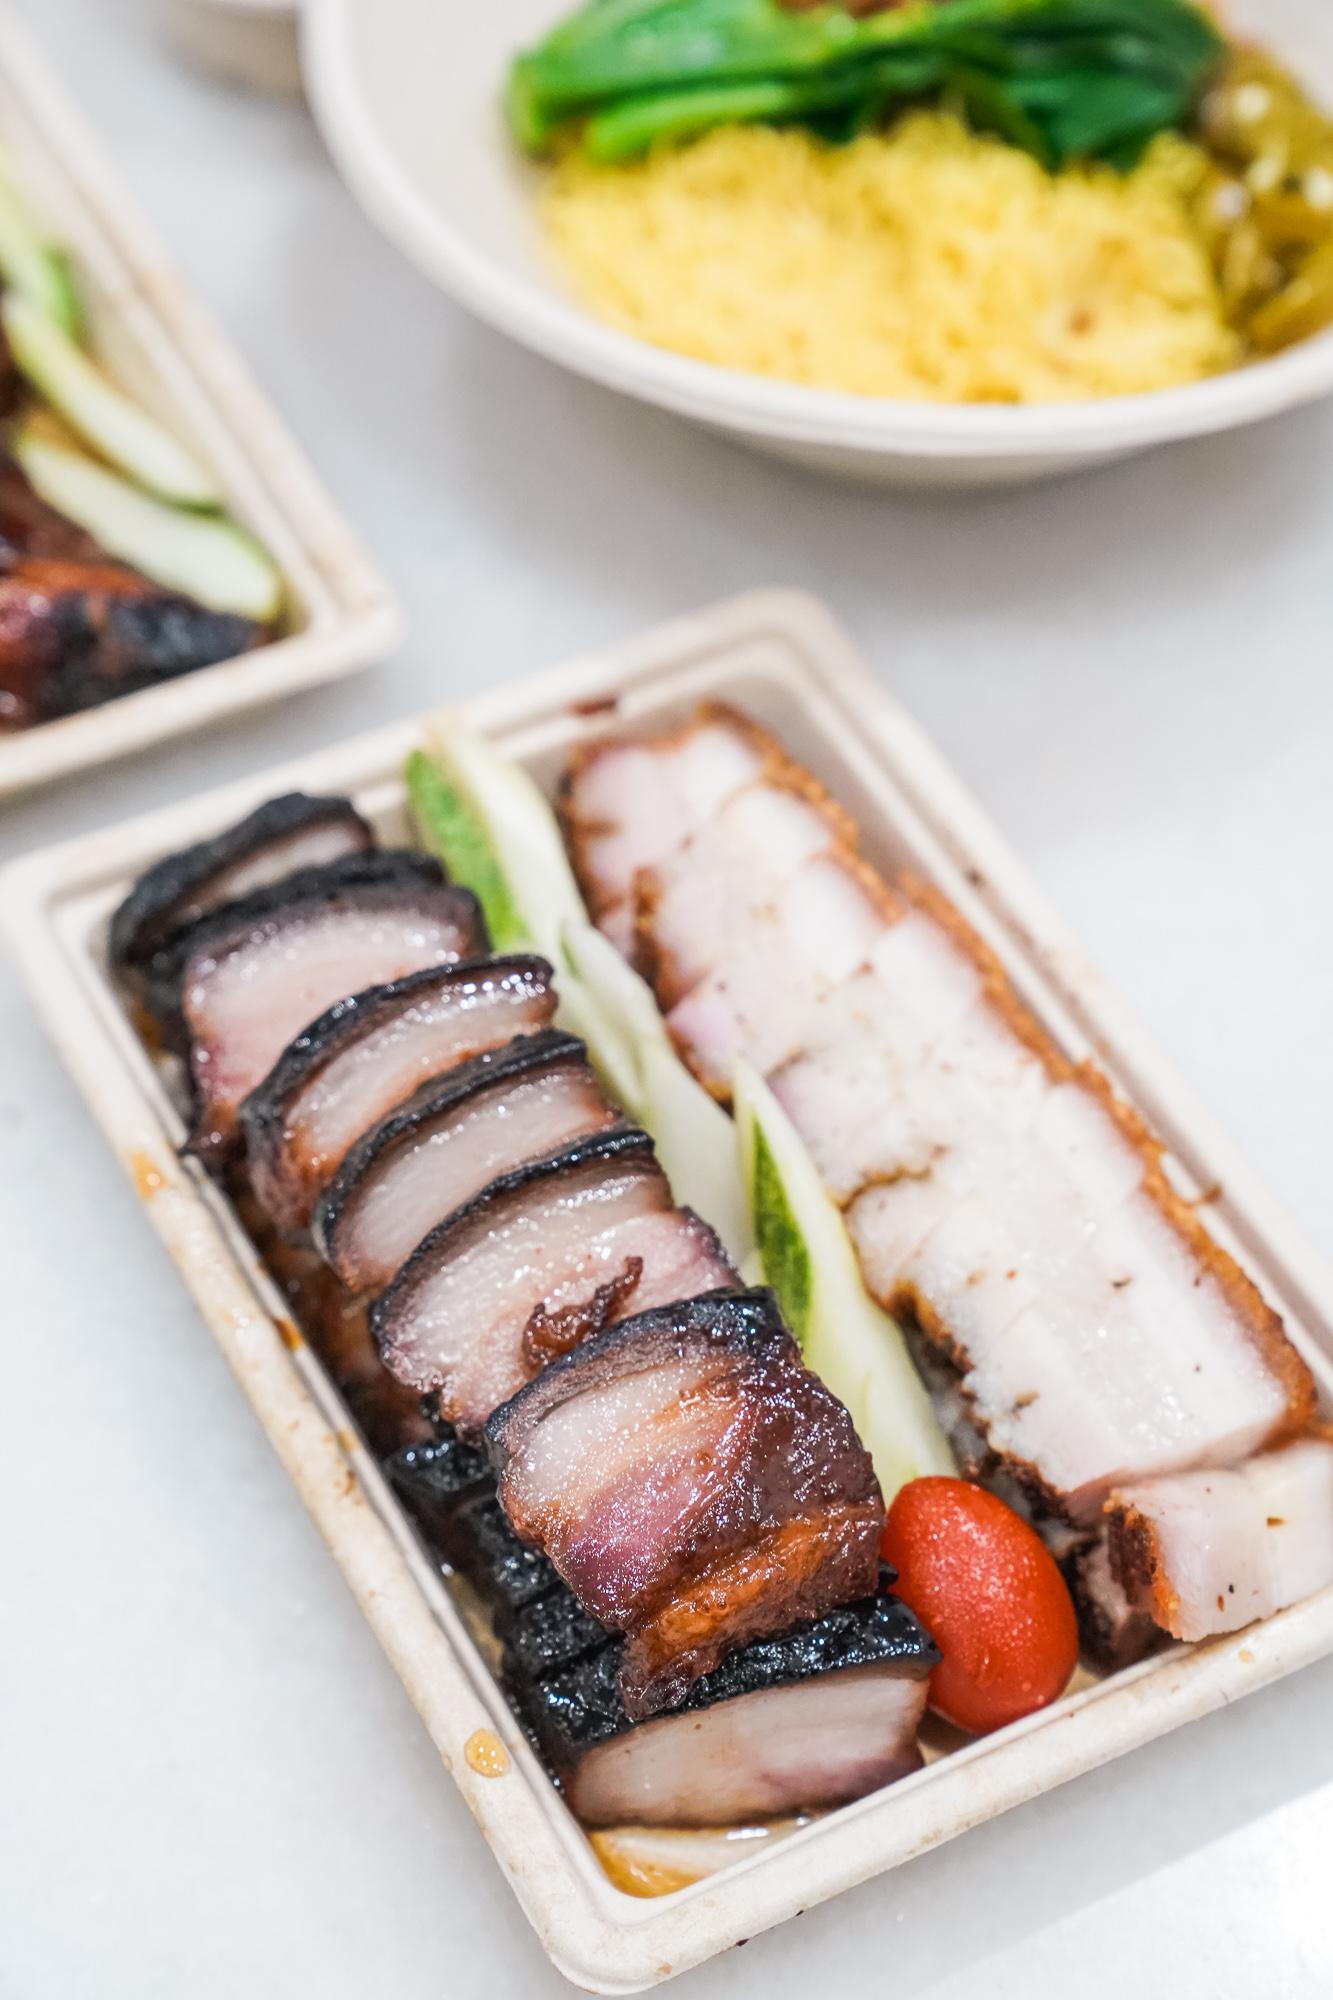 Laifabar Fatty Char Siew Roast Pork